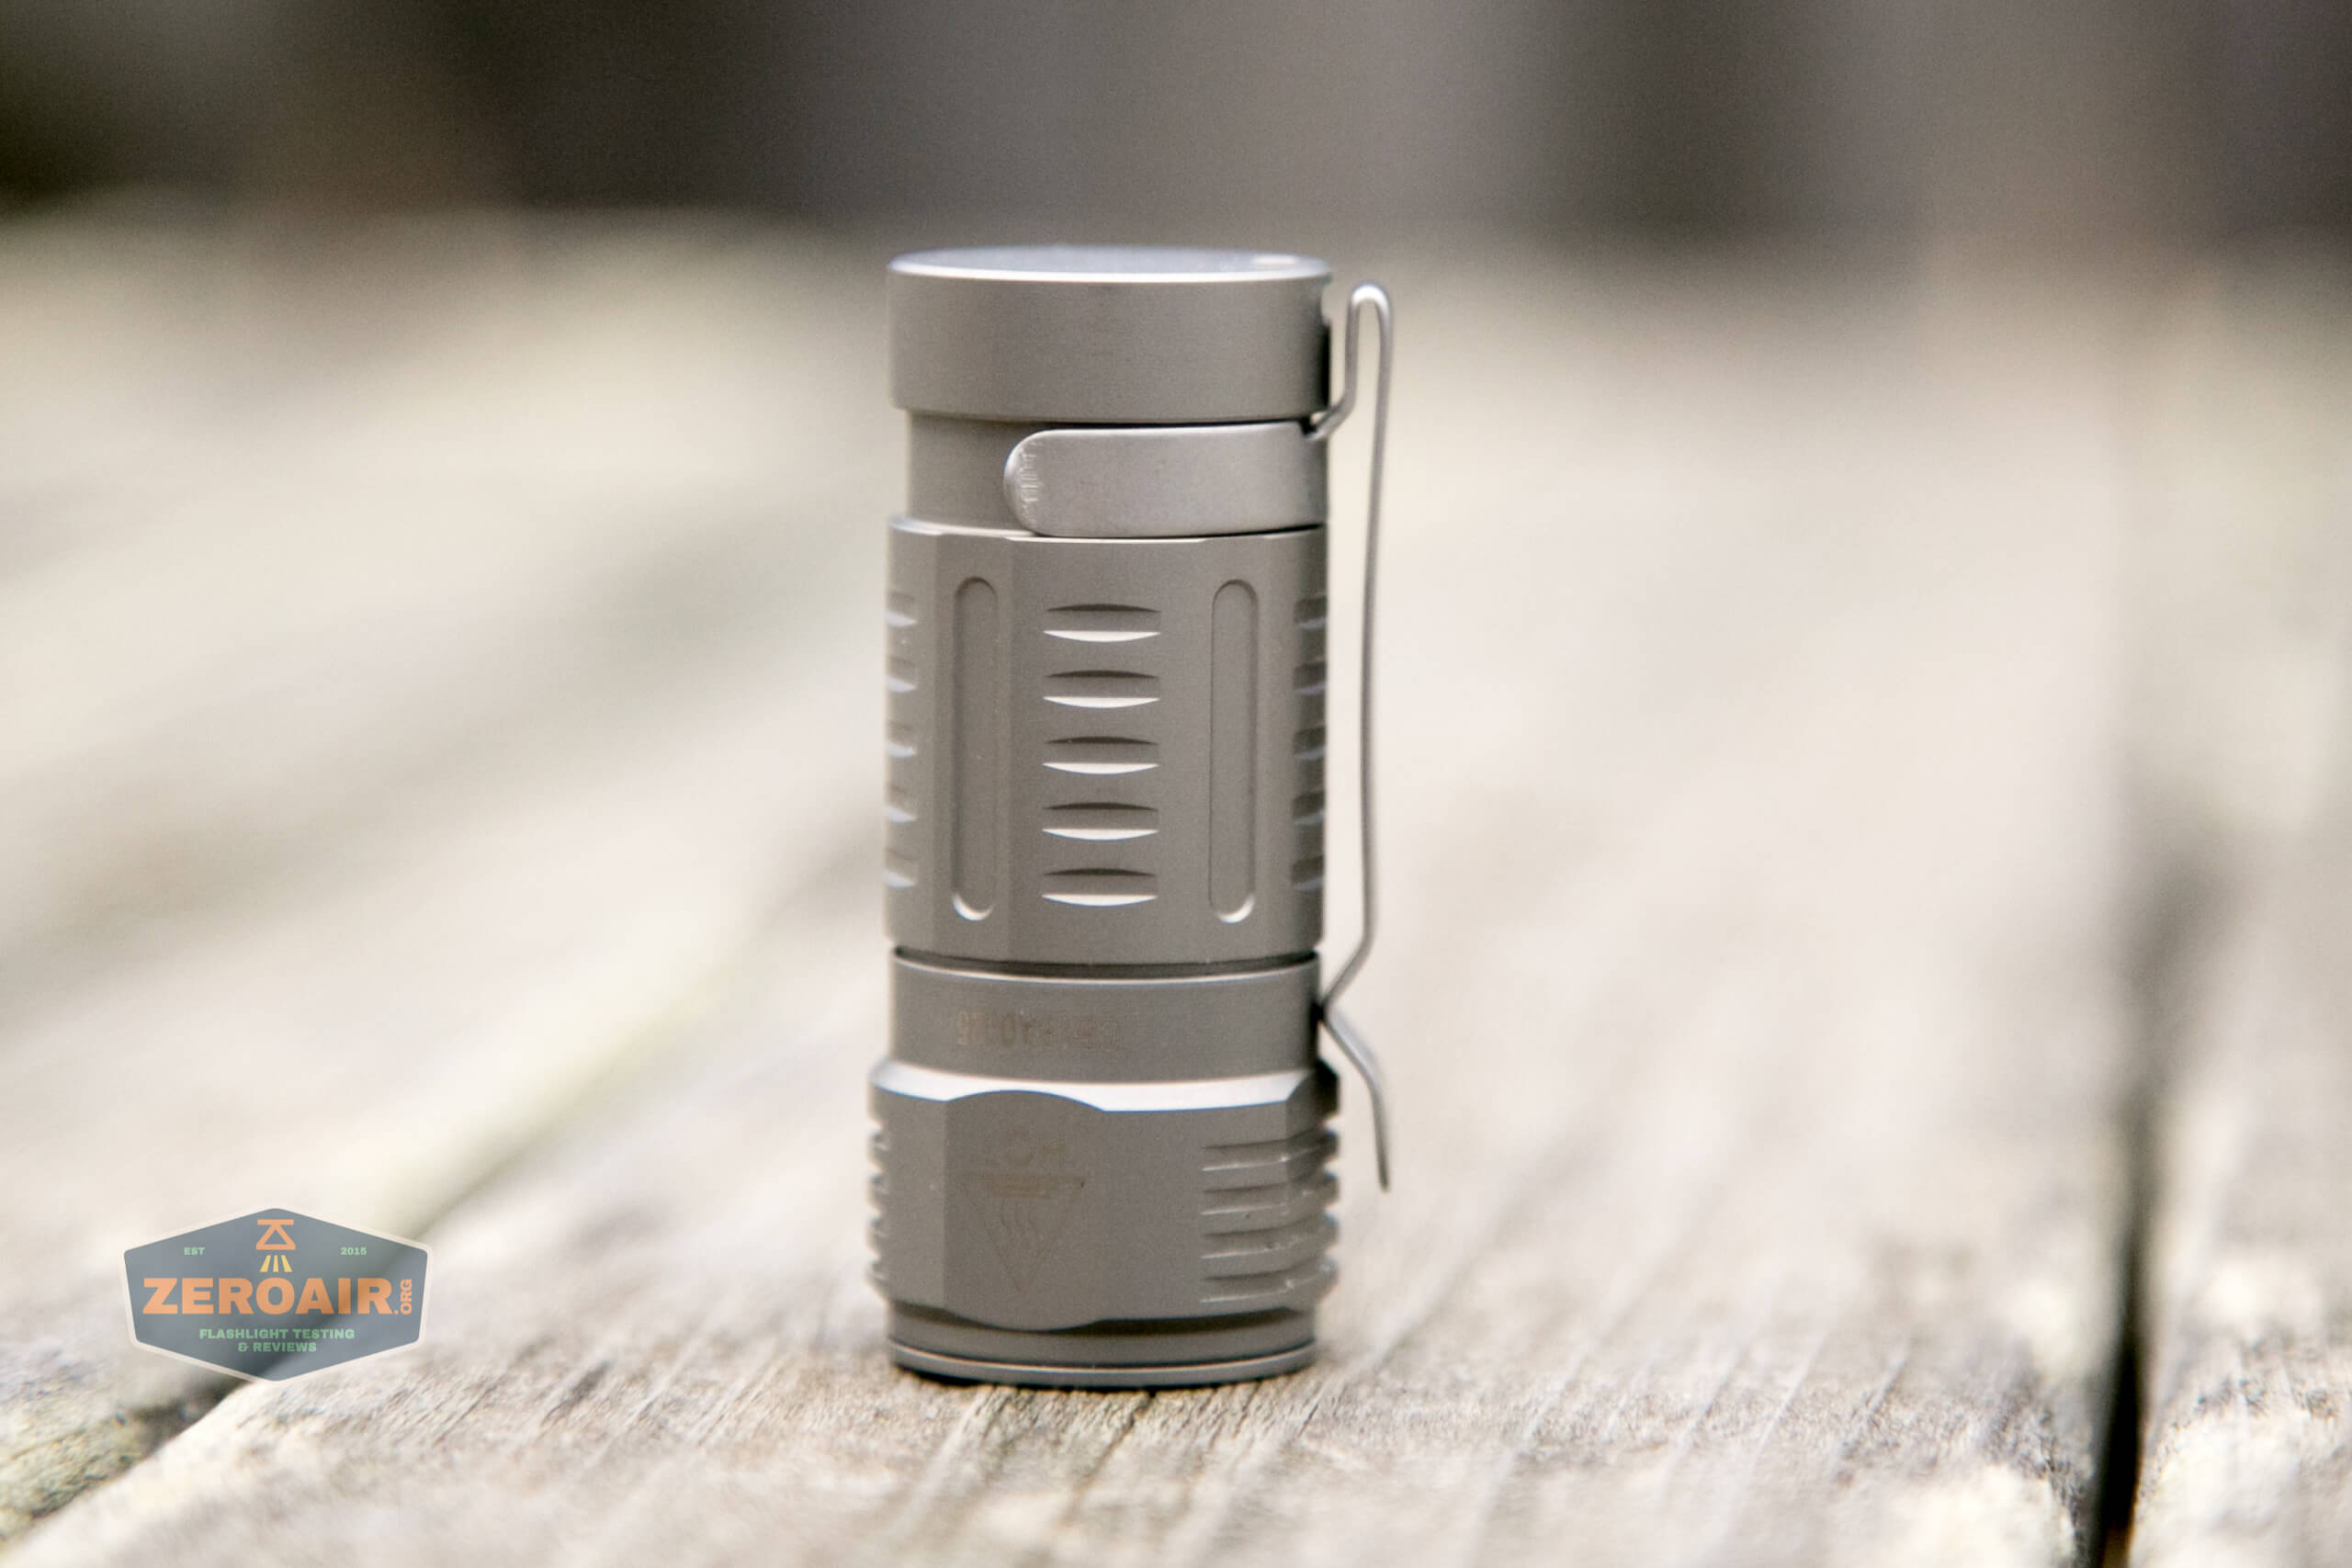 freasygears cyansky m3 titanium pocket flashlight pocket clip installed